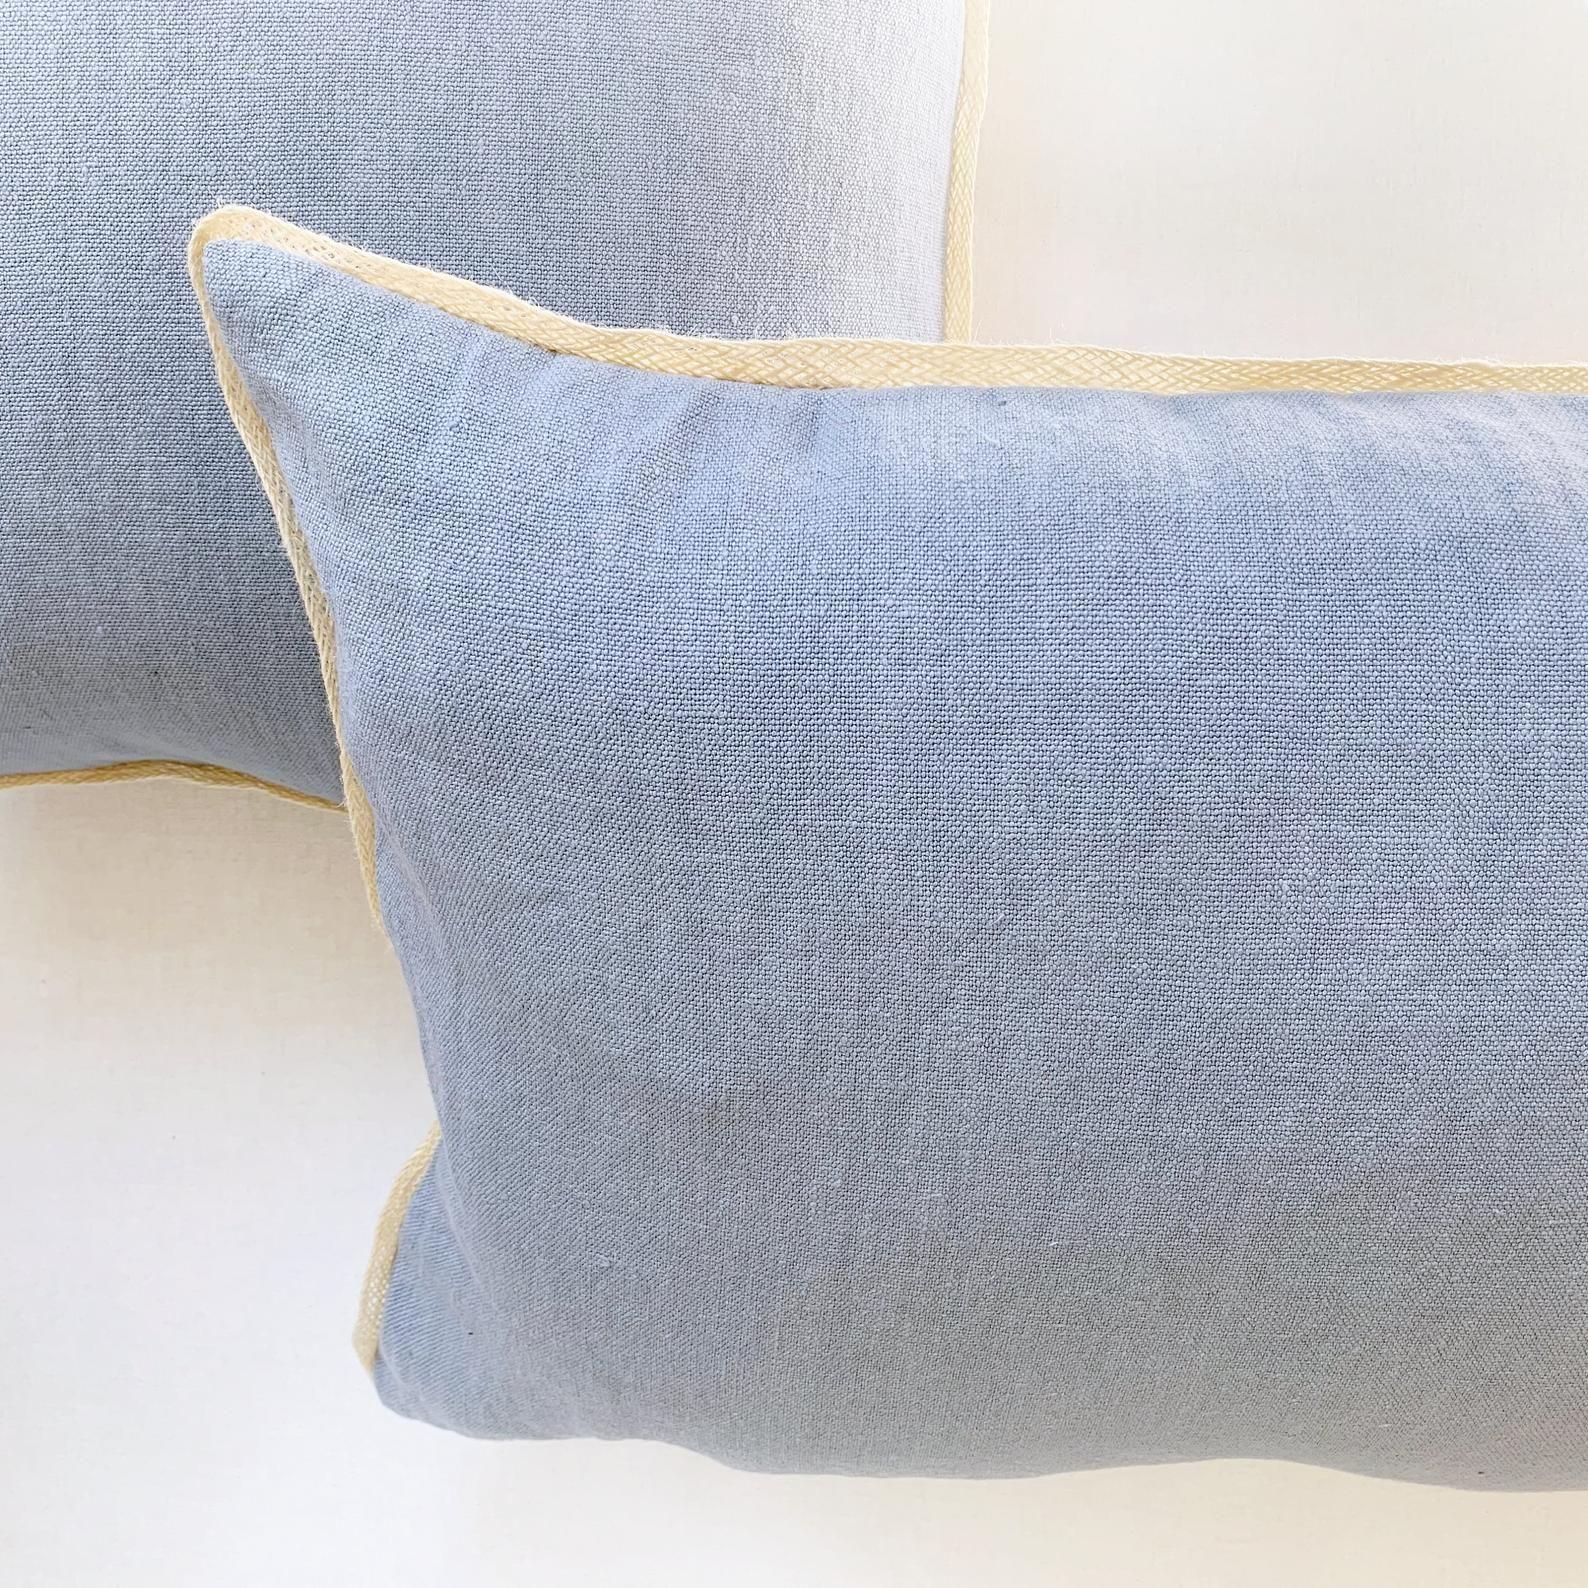 Italian Linen Pillow With Trim Large Lumbar Pillow Cover Blue Pillow Cover For Nautical Decor Large Pillows Long Lumbar Throw Cushion Lumbar Pillow Cover Linen Pillows Italian Linens